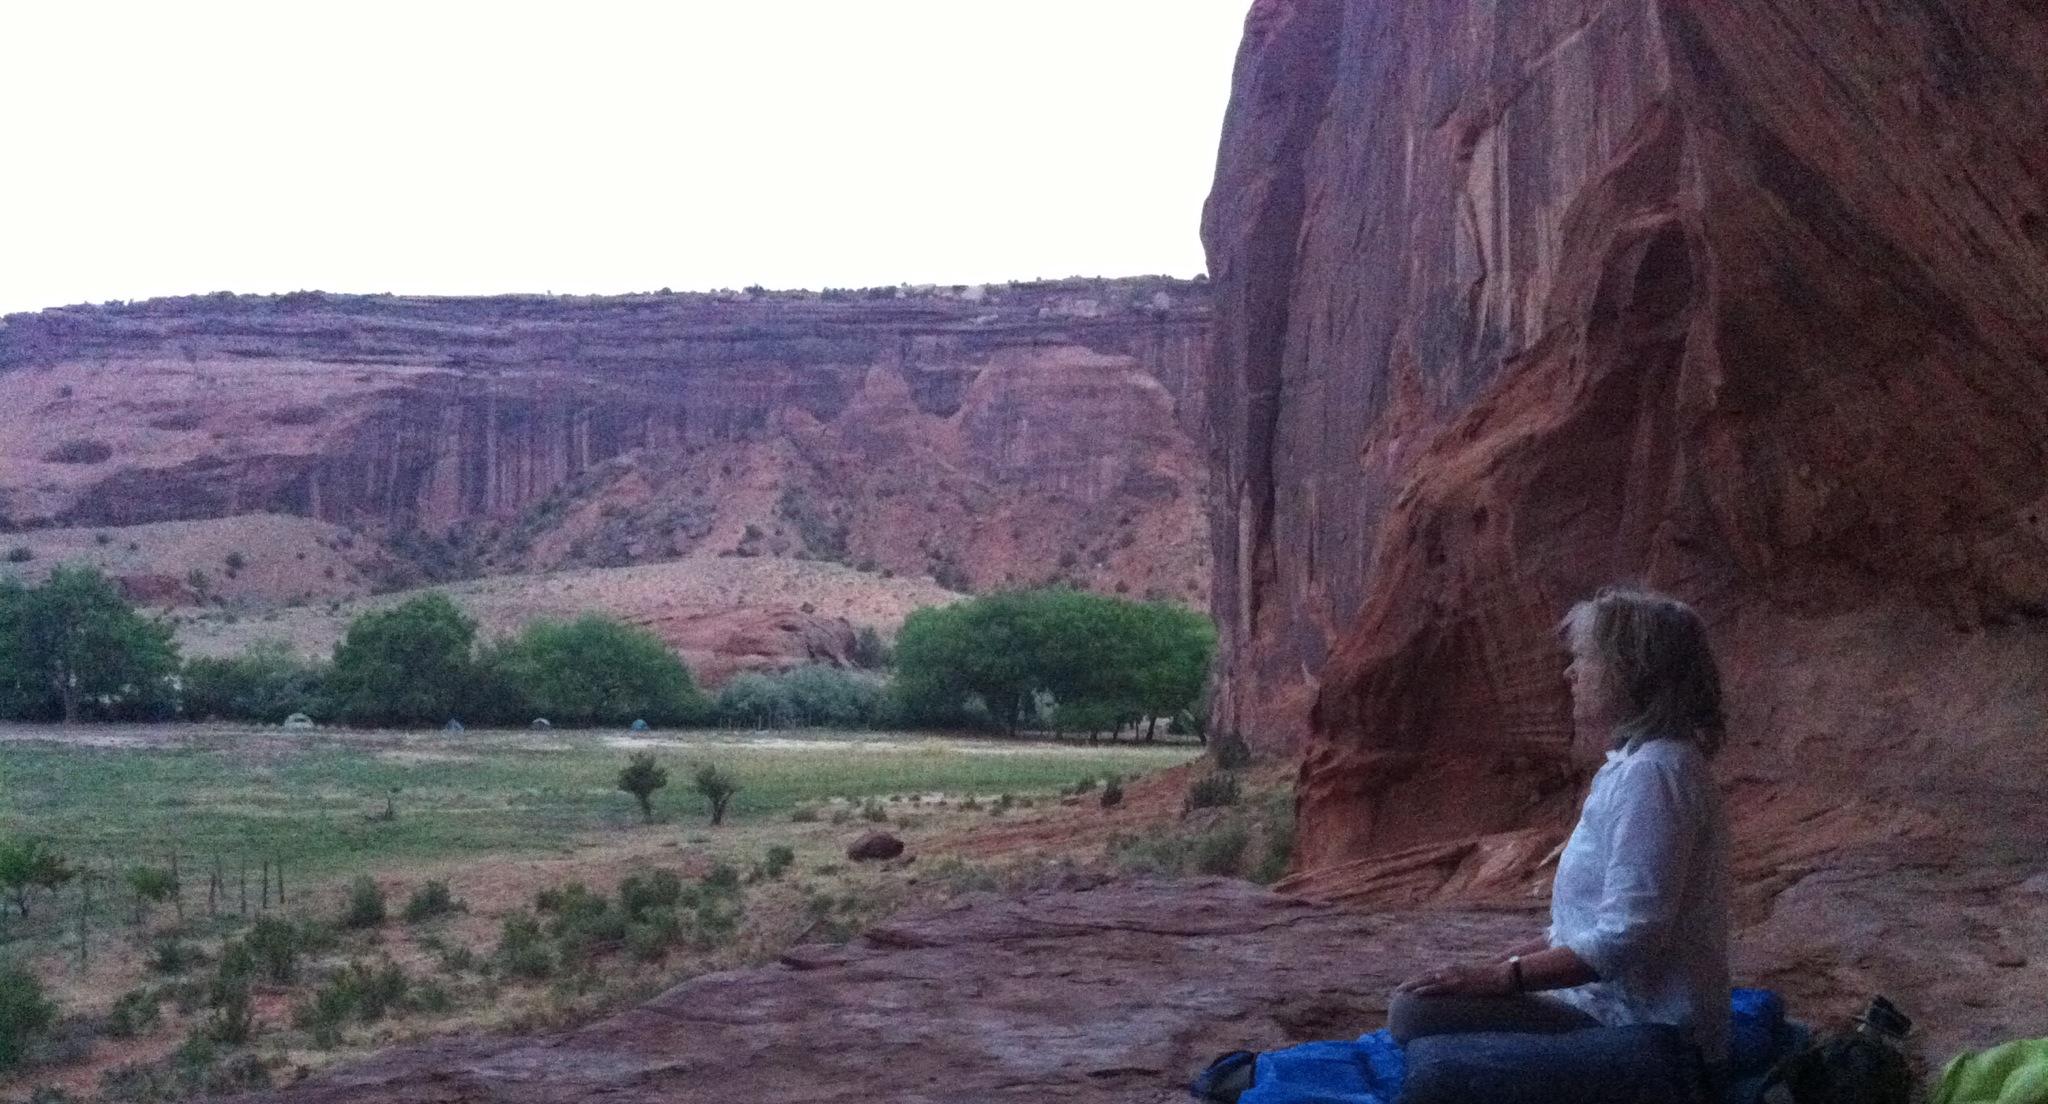 Sleeping on a ledge next to 1000 year old Anasazi paintings